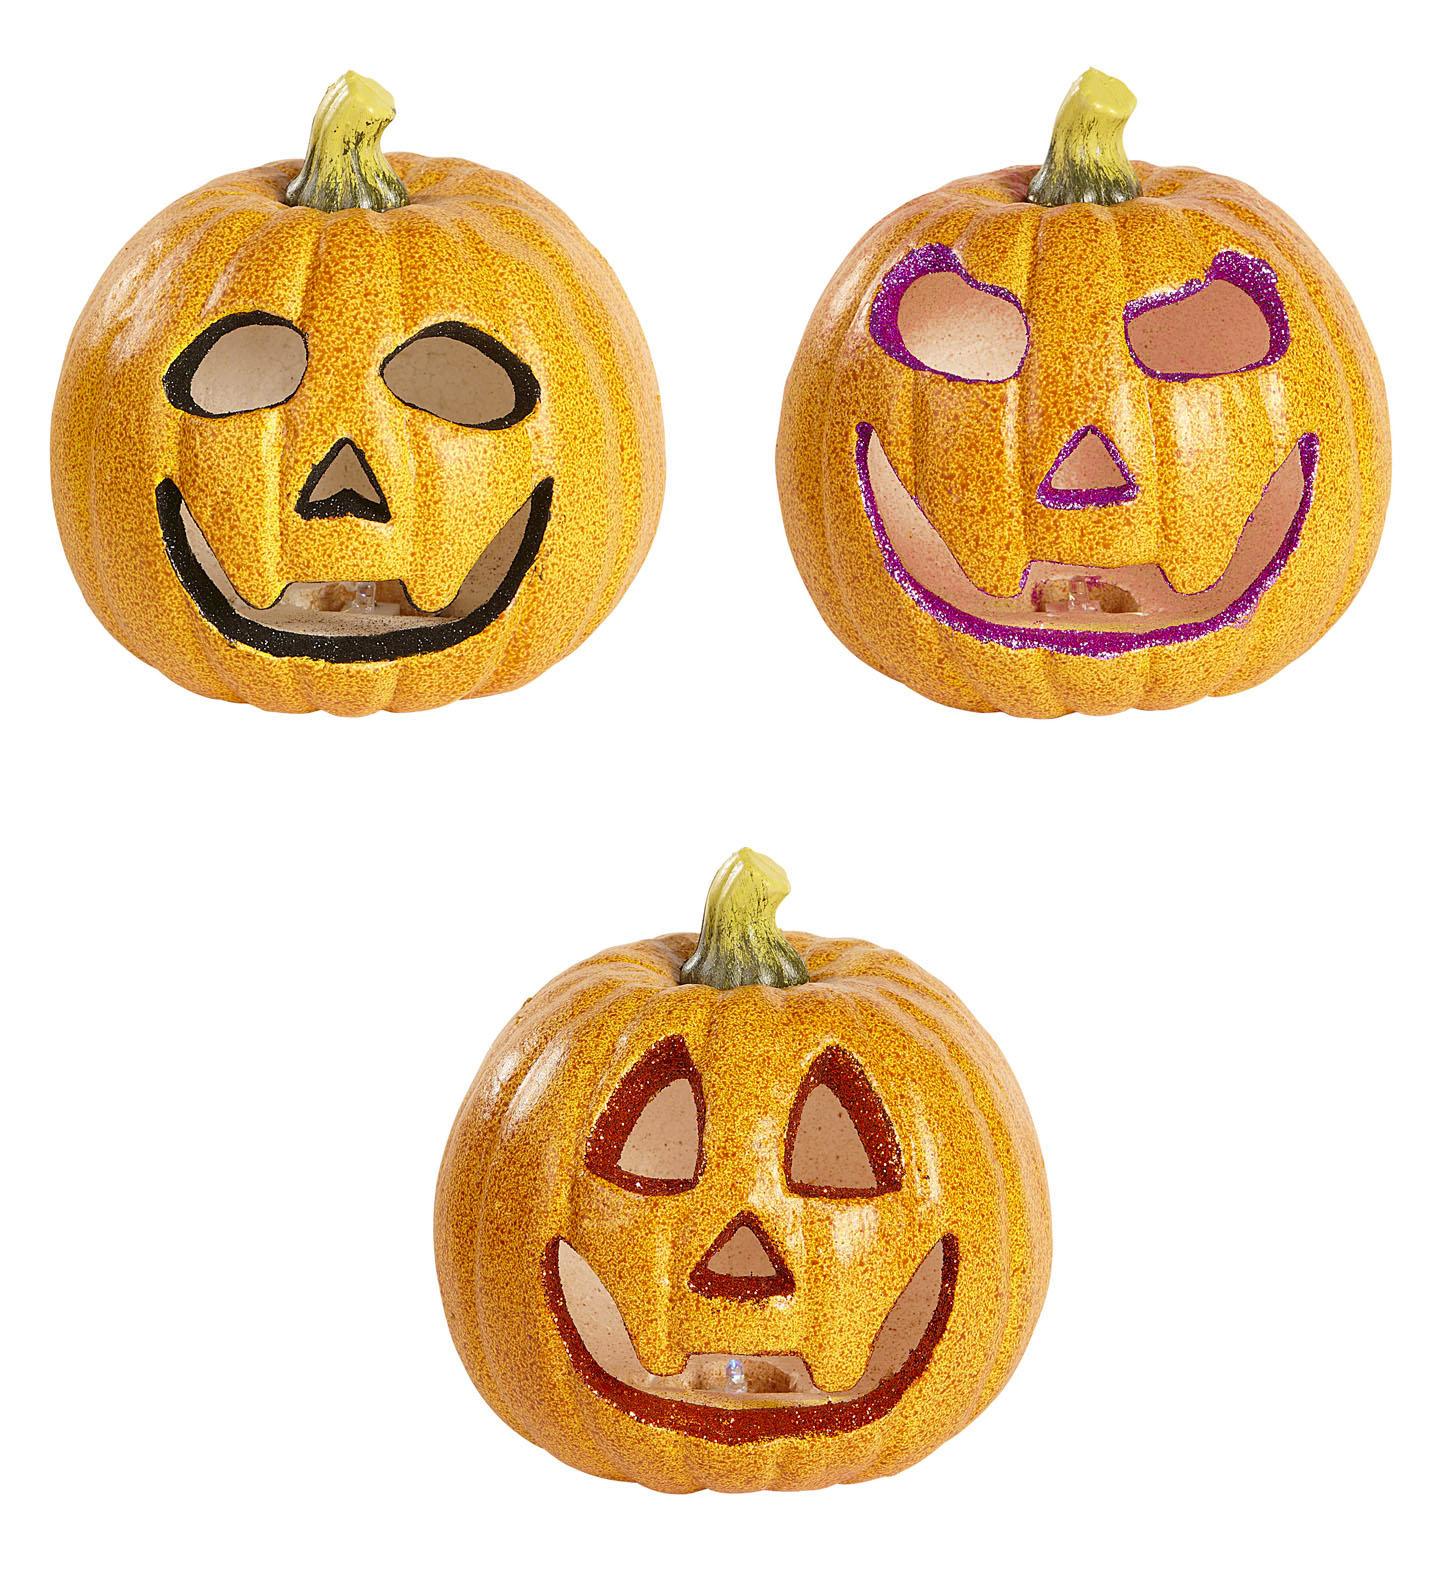 Image Result For Decoration Citrouille Pour Halloween Citrouille Lumineuse Clignotante Decoration Halloween